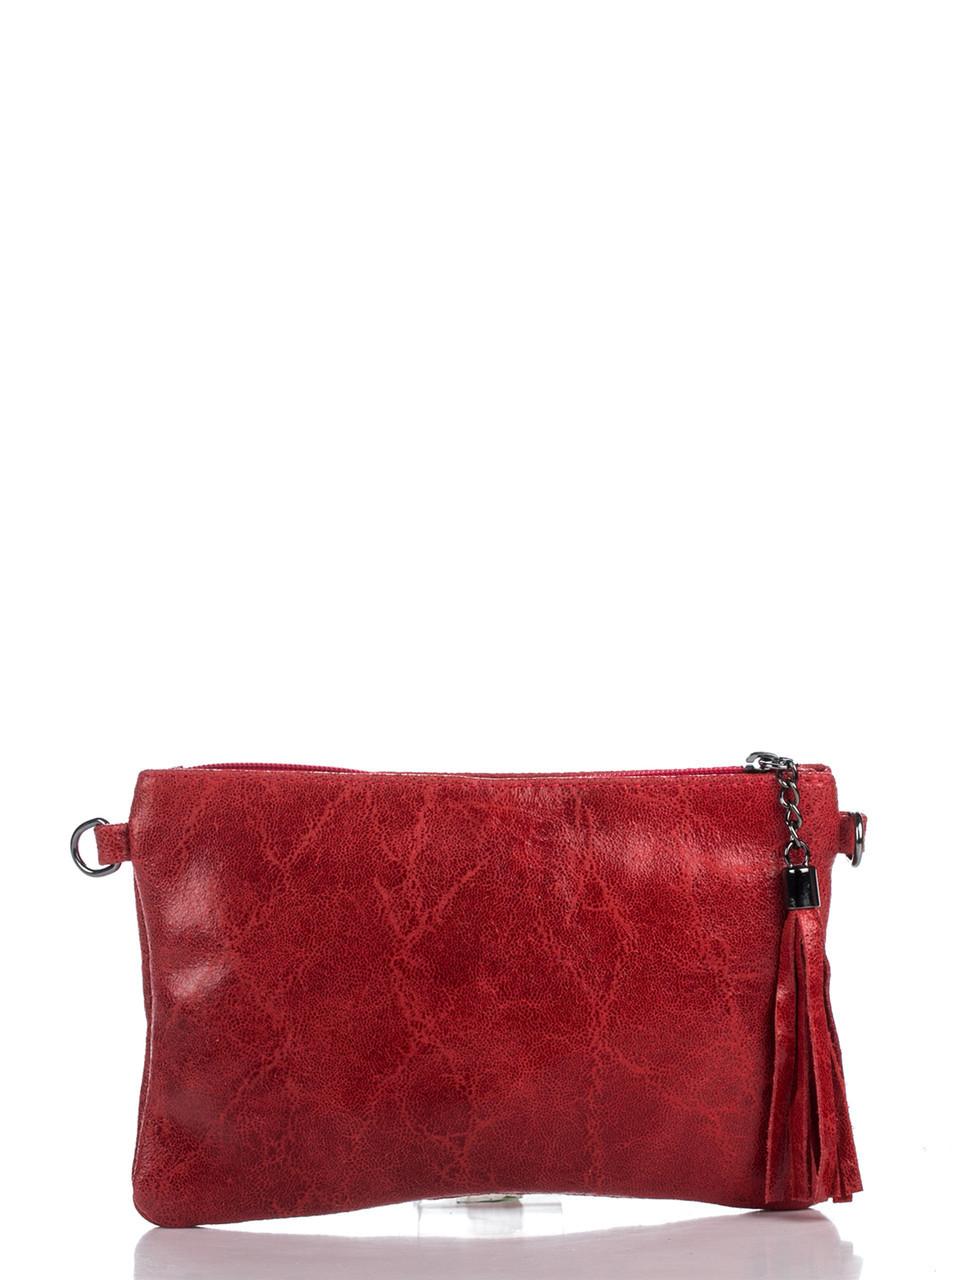 Женская кожаная сумка KATE Diva's Bag цвет красный